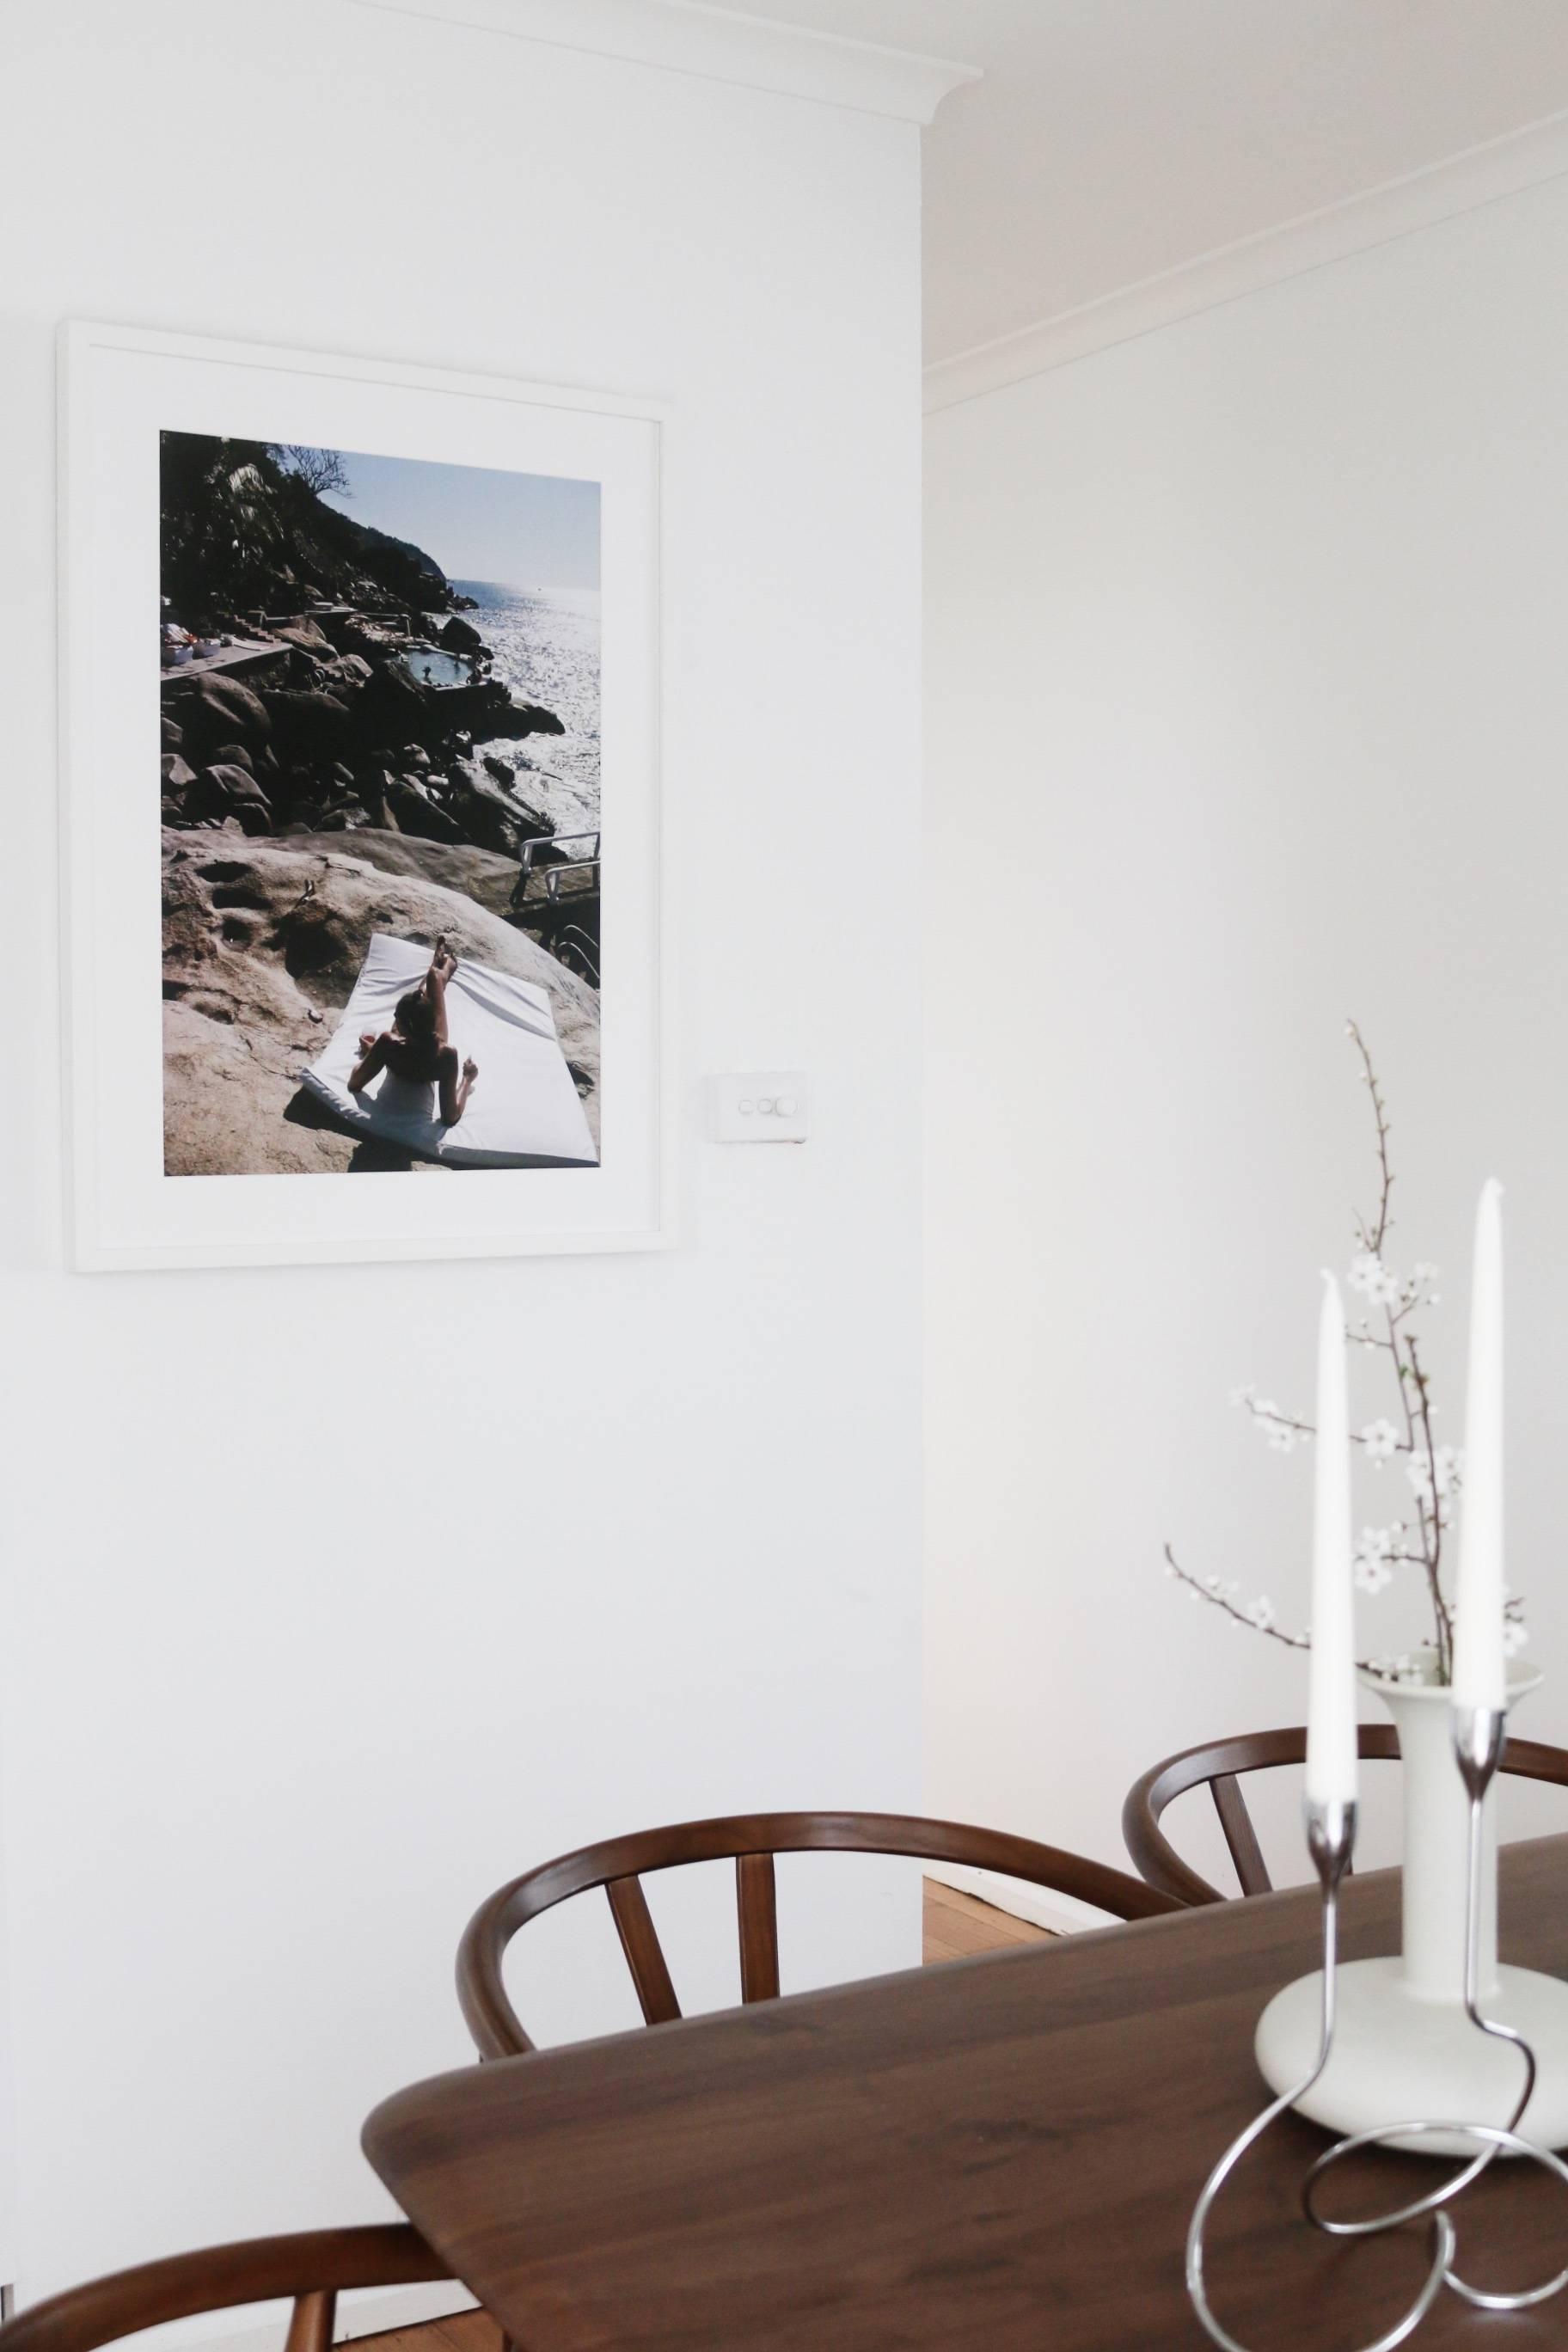 Las Brisas by Slim Aarons - Hanging in the dining room of Gemma Watts